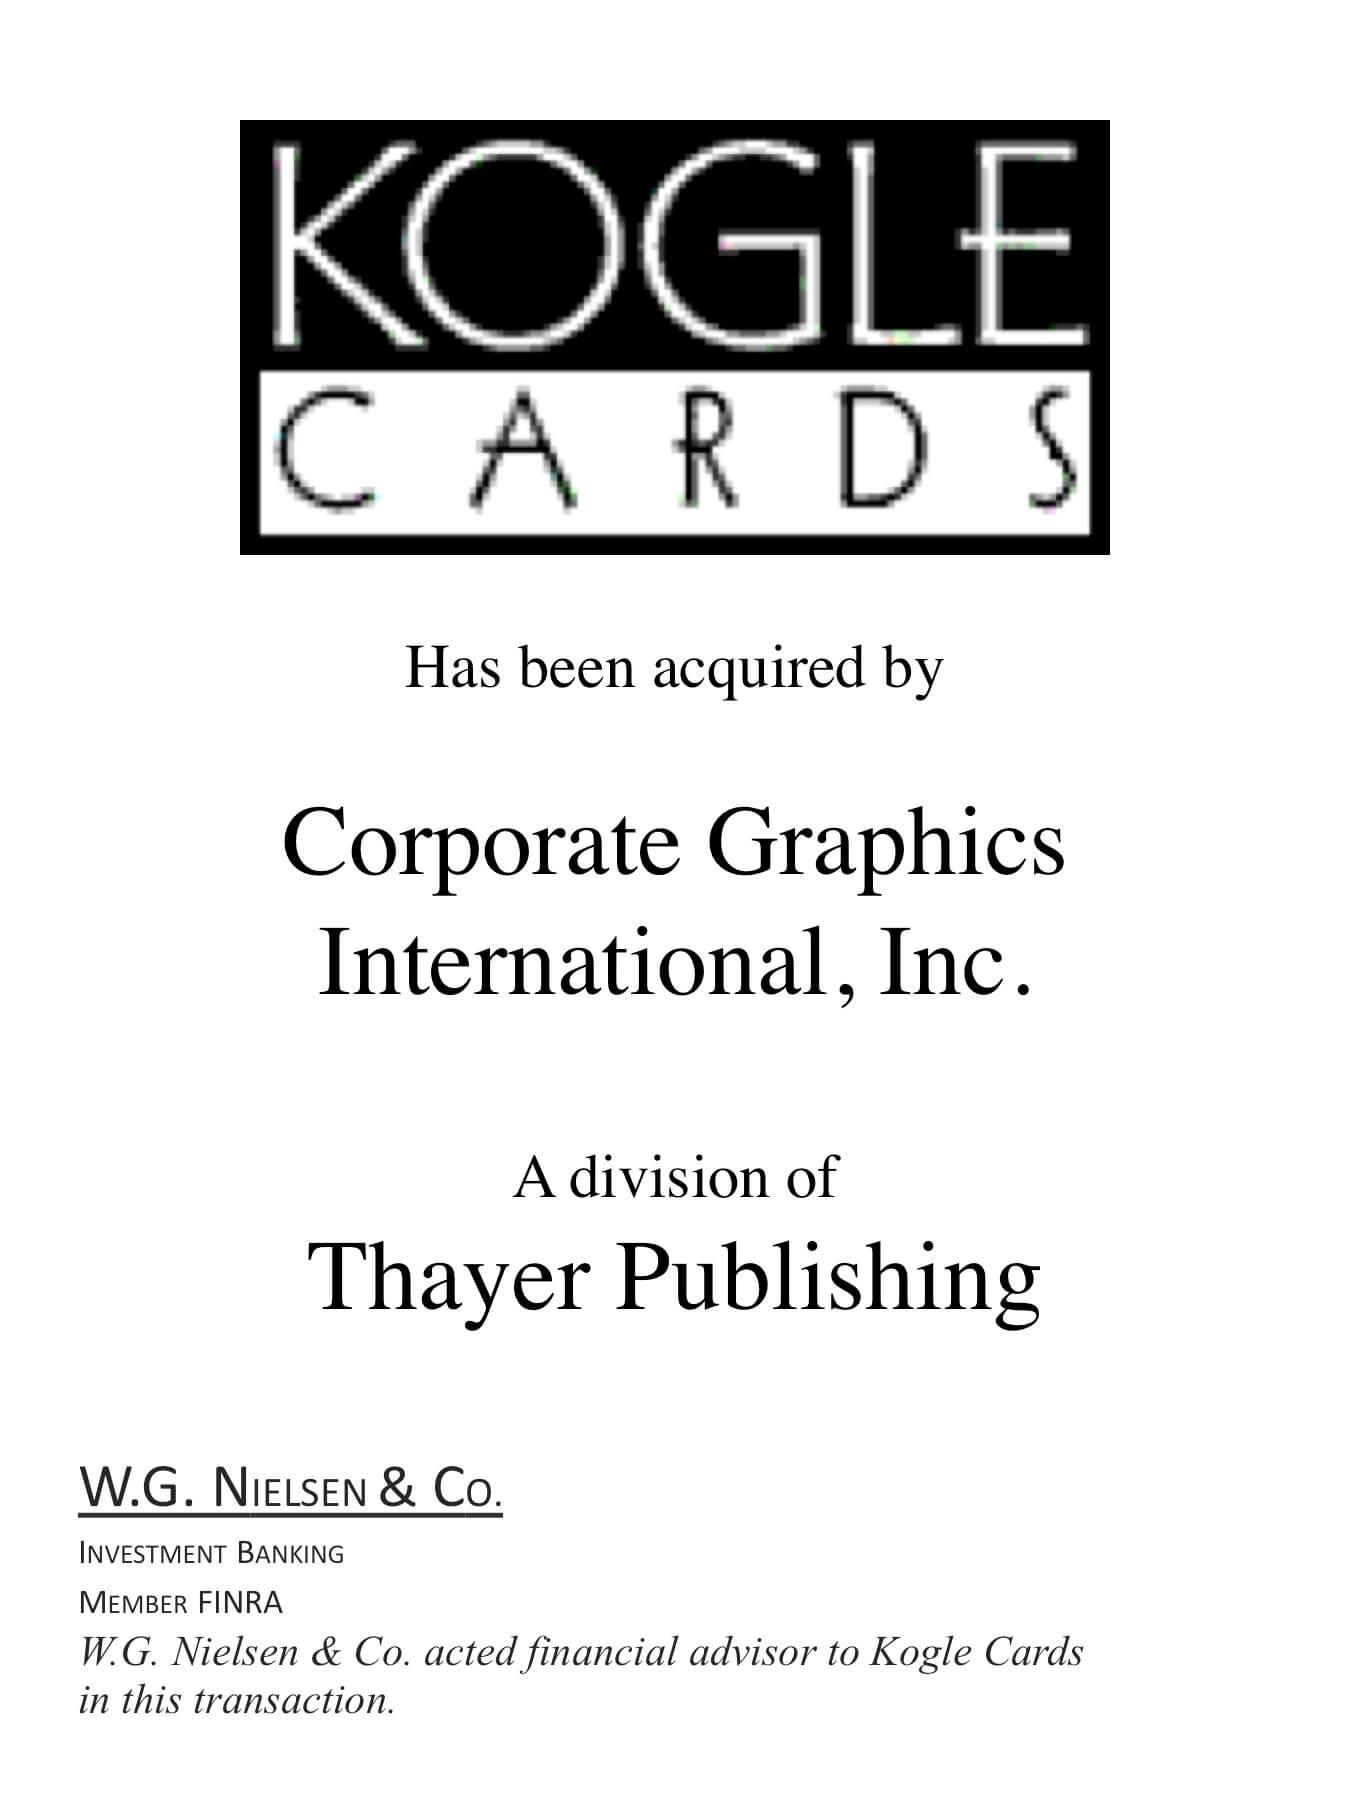 kogle cards investment banking transaction